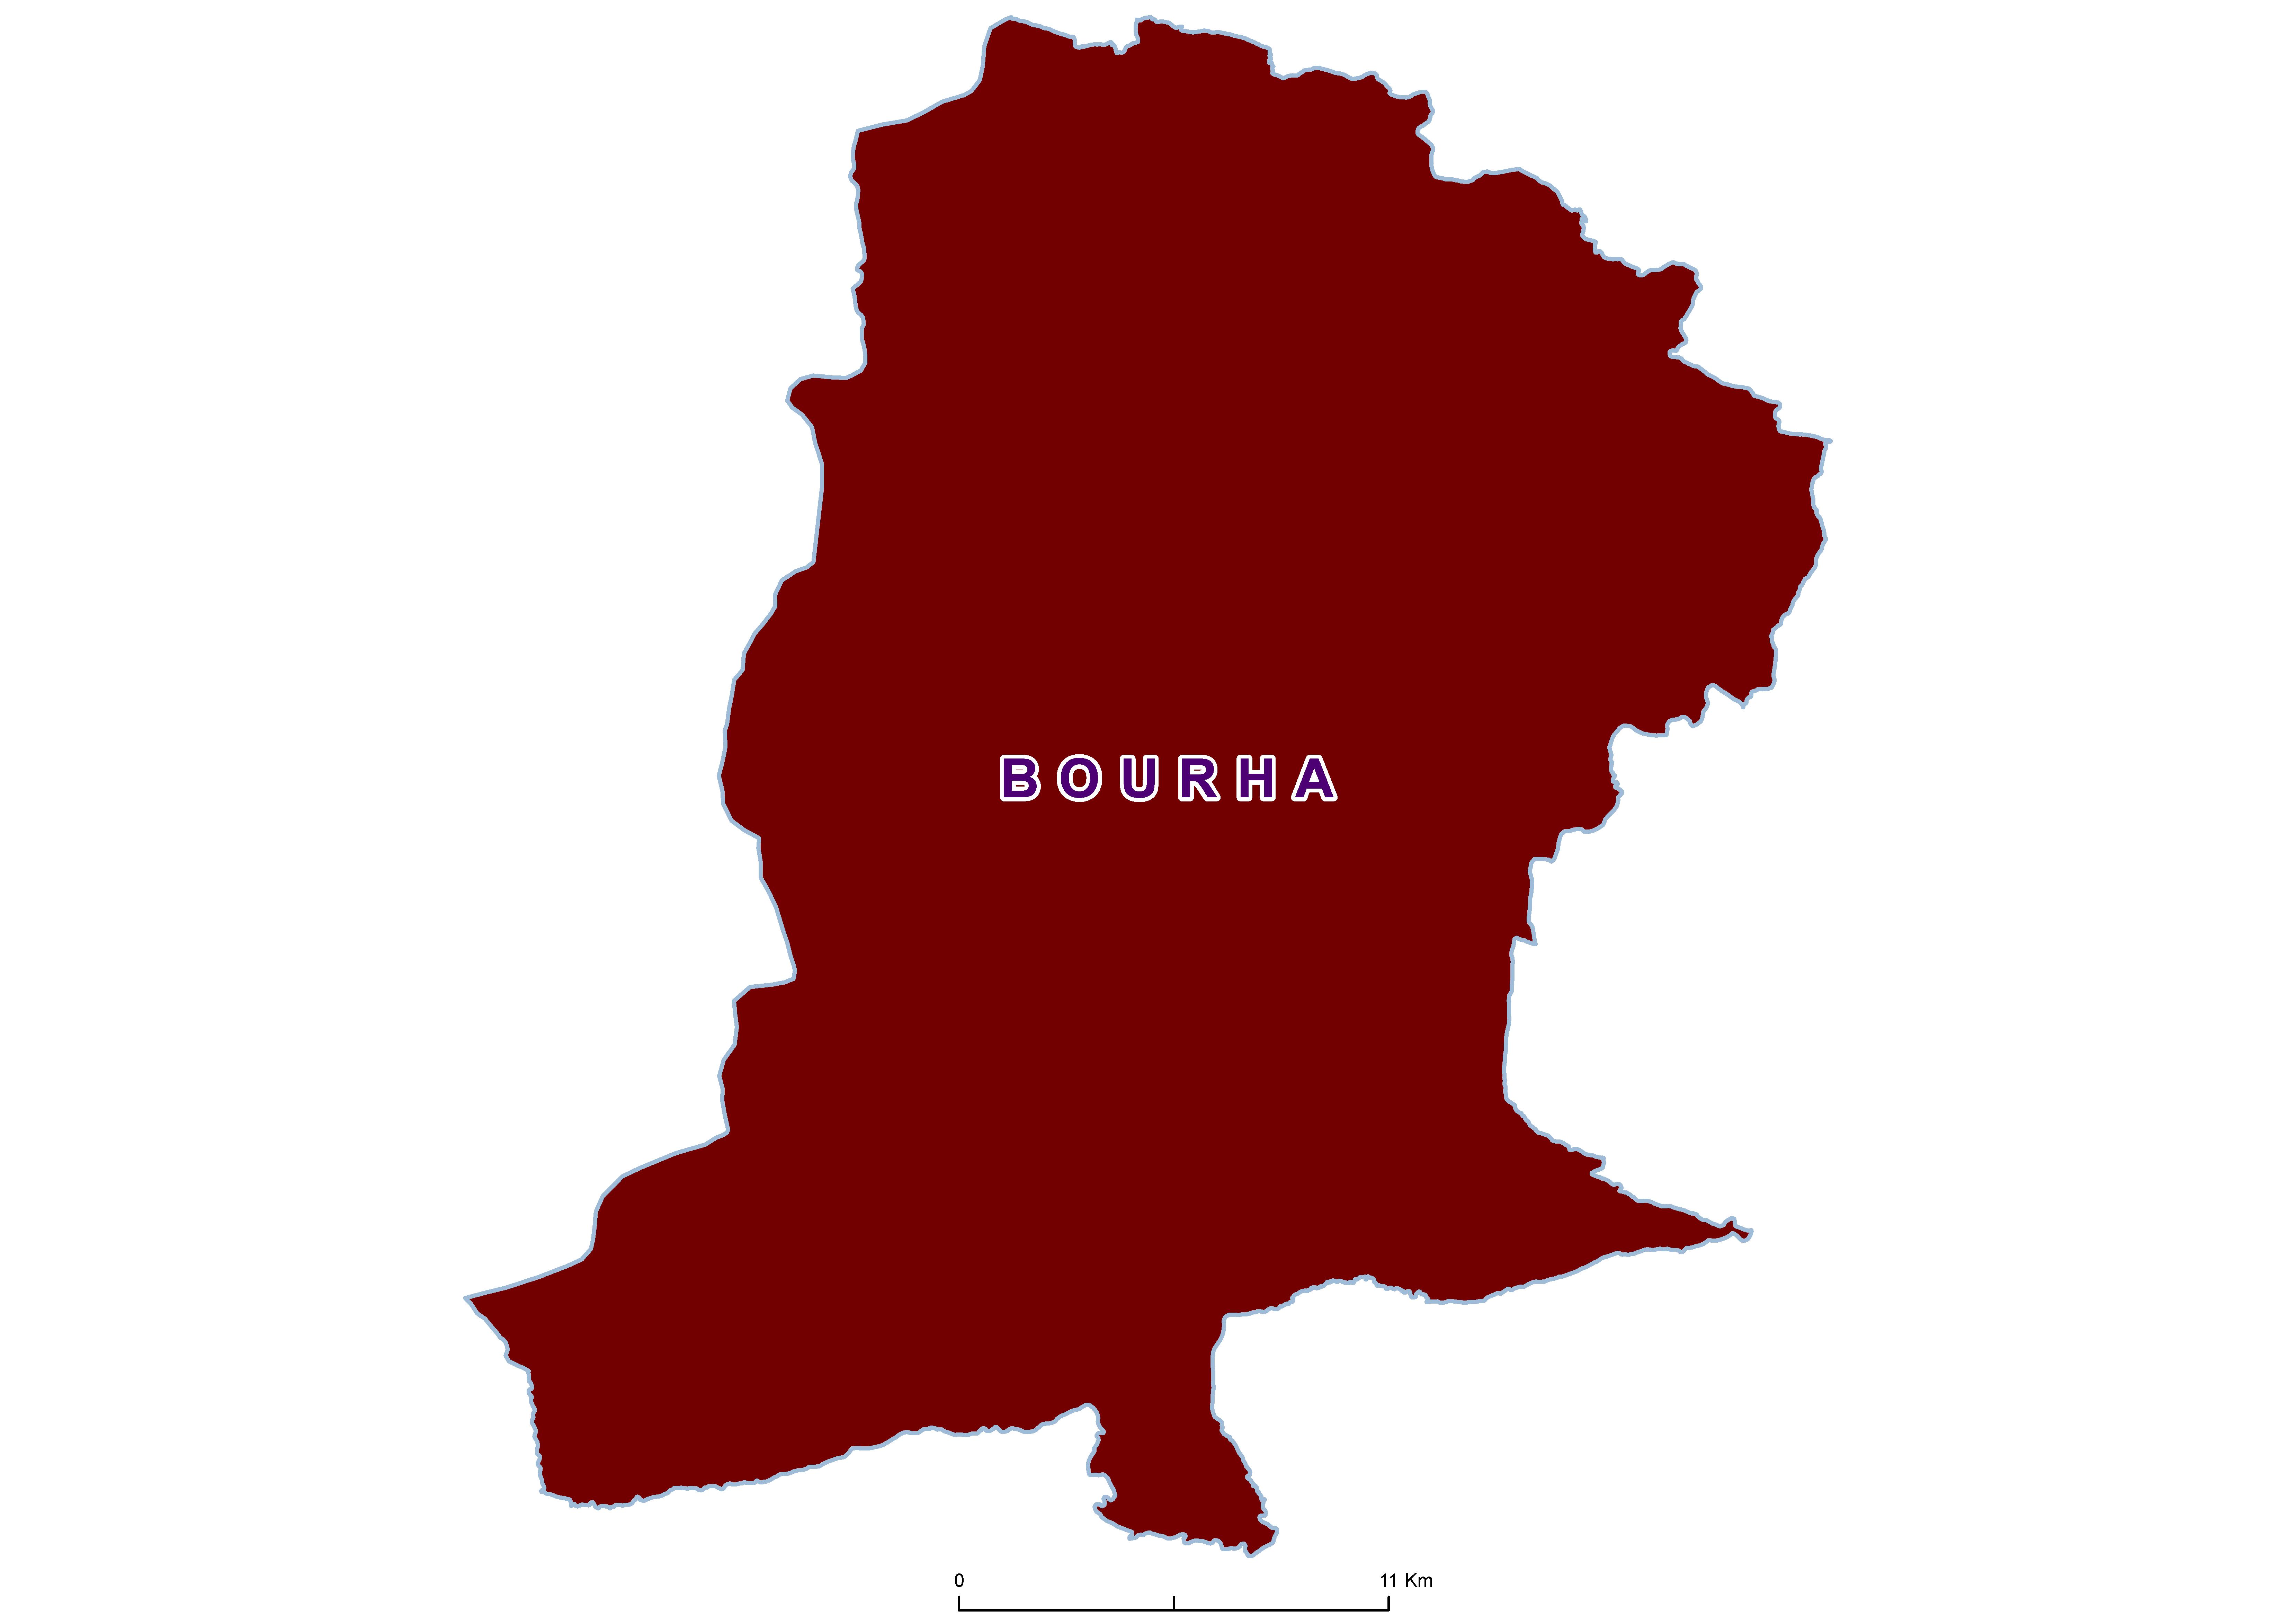 Bourha Max SCH 19850001